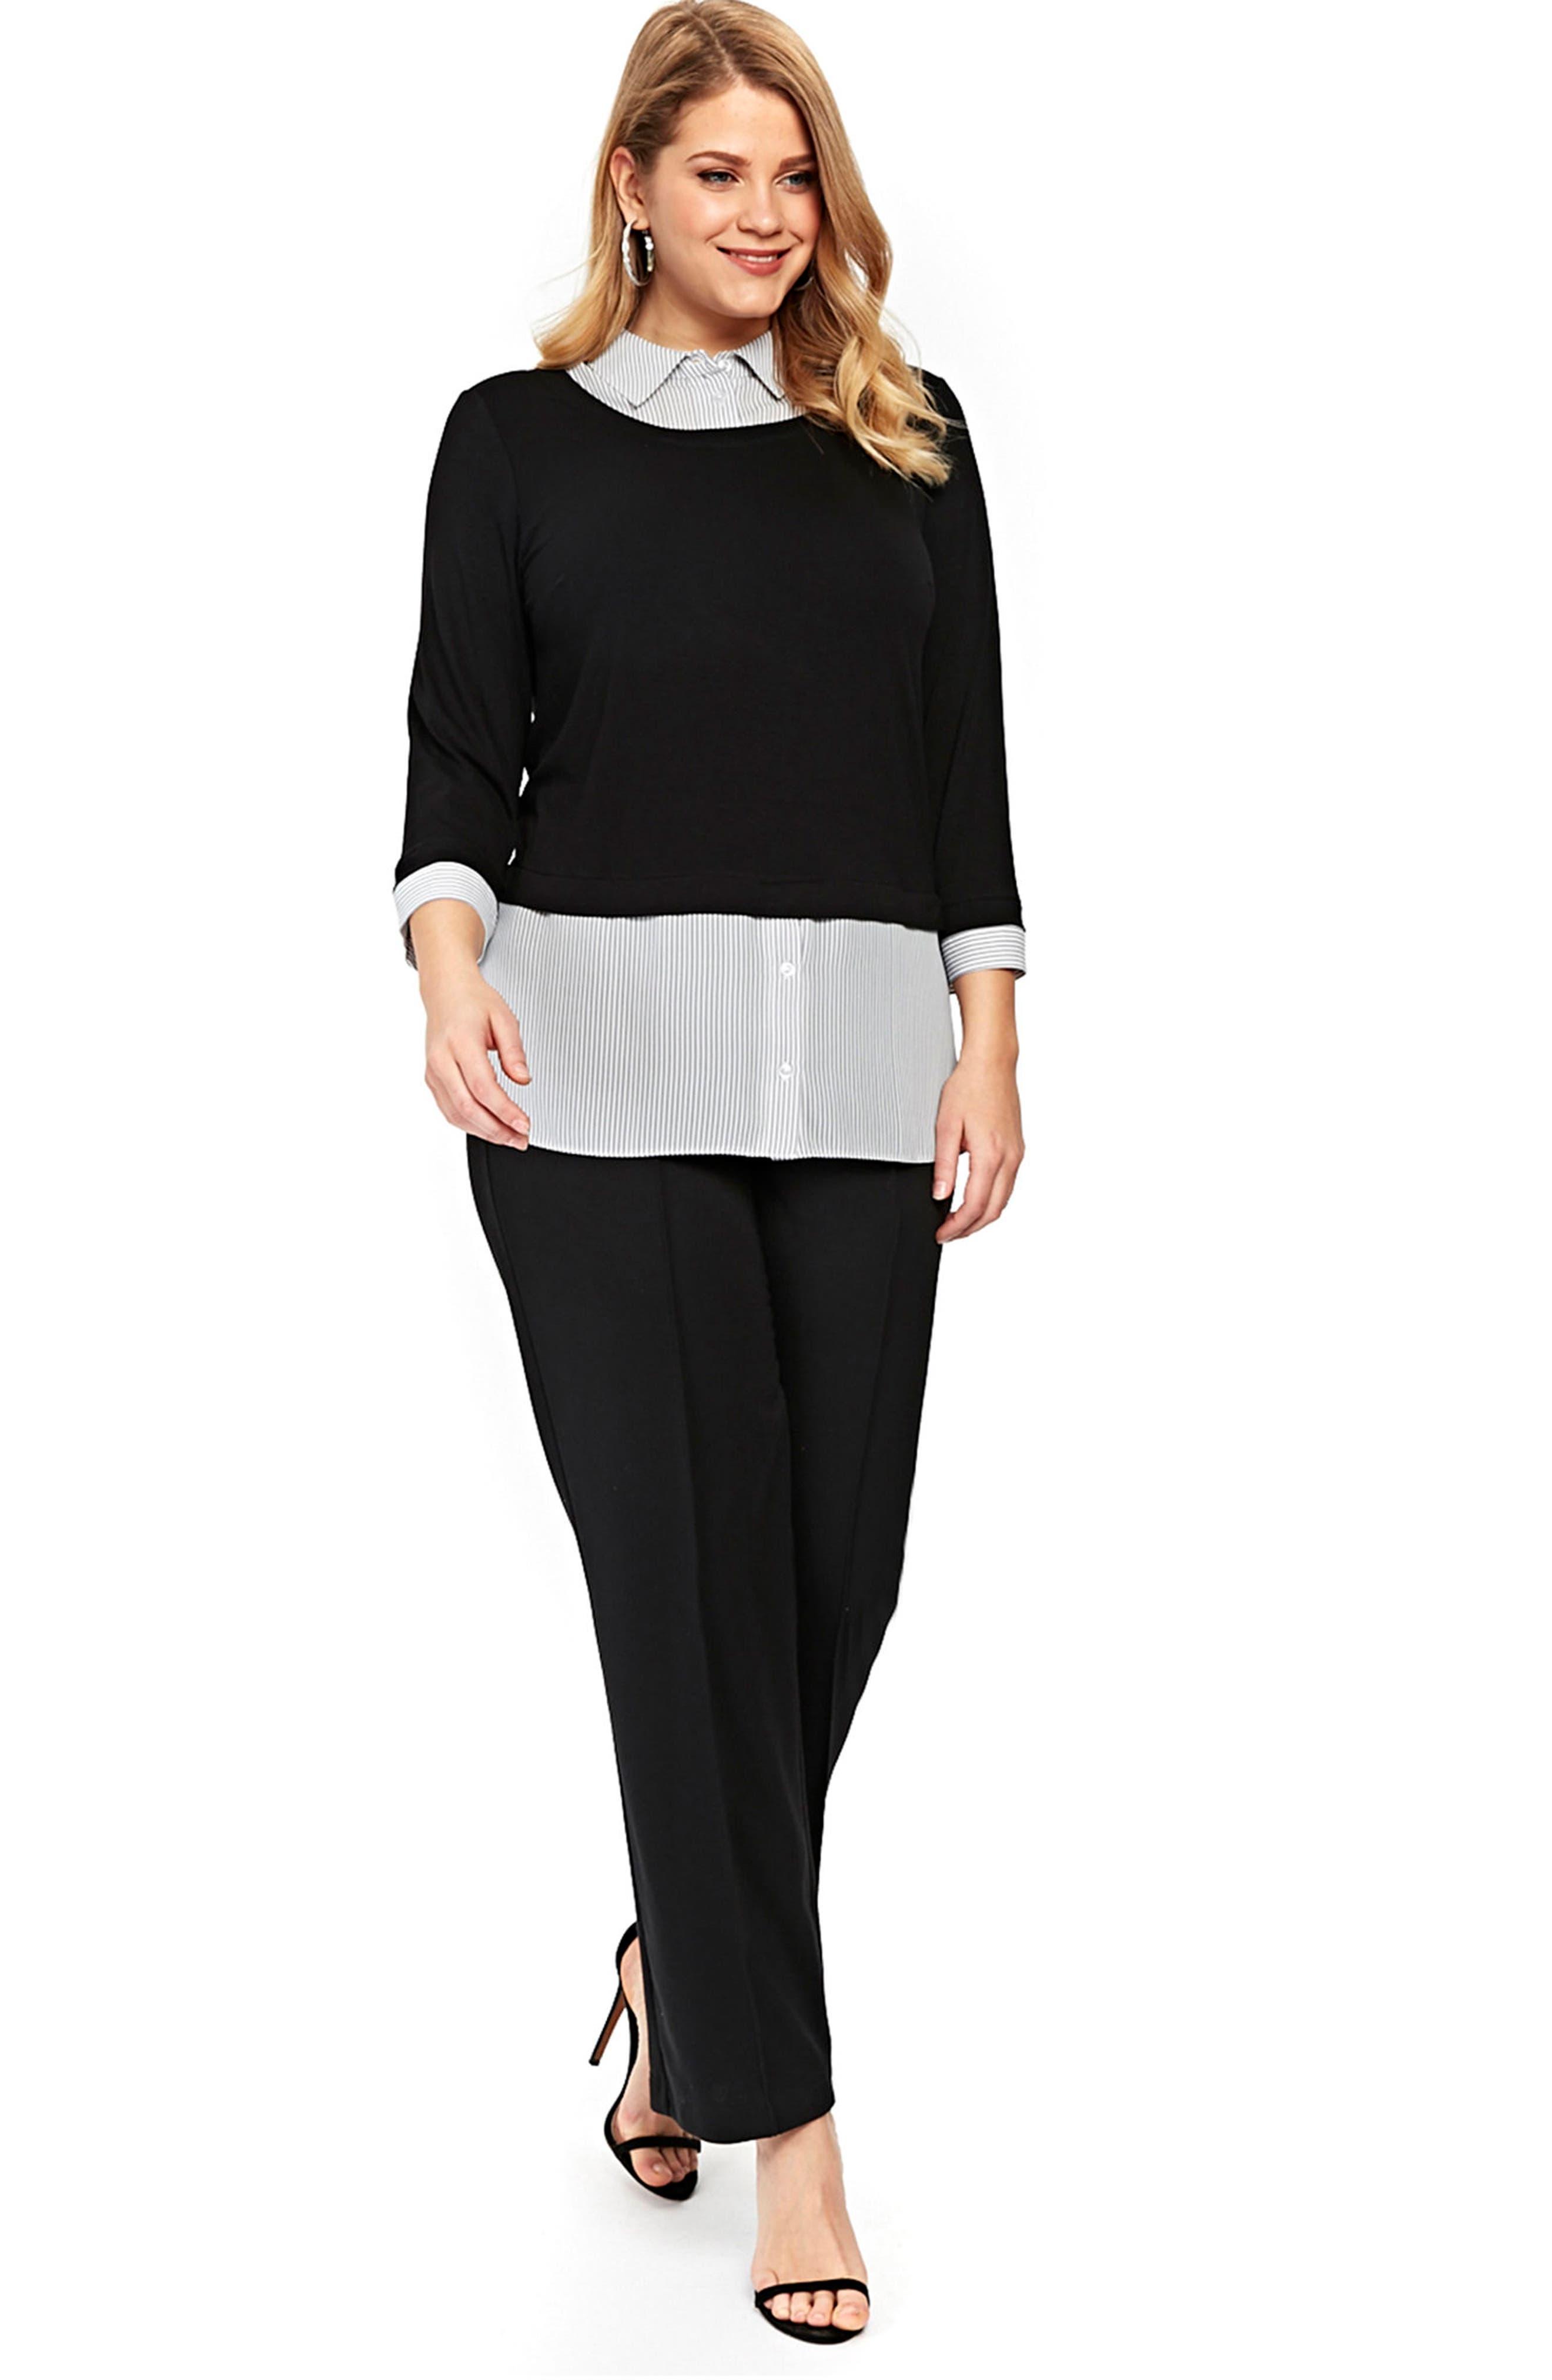 Stripe & Solid 2-in-1 Shirt,                             Alternate thumbnail 2, color,                             Dark Multi